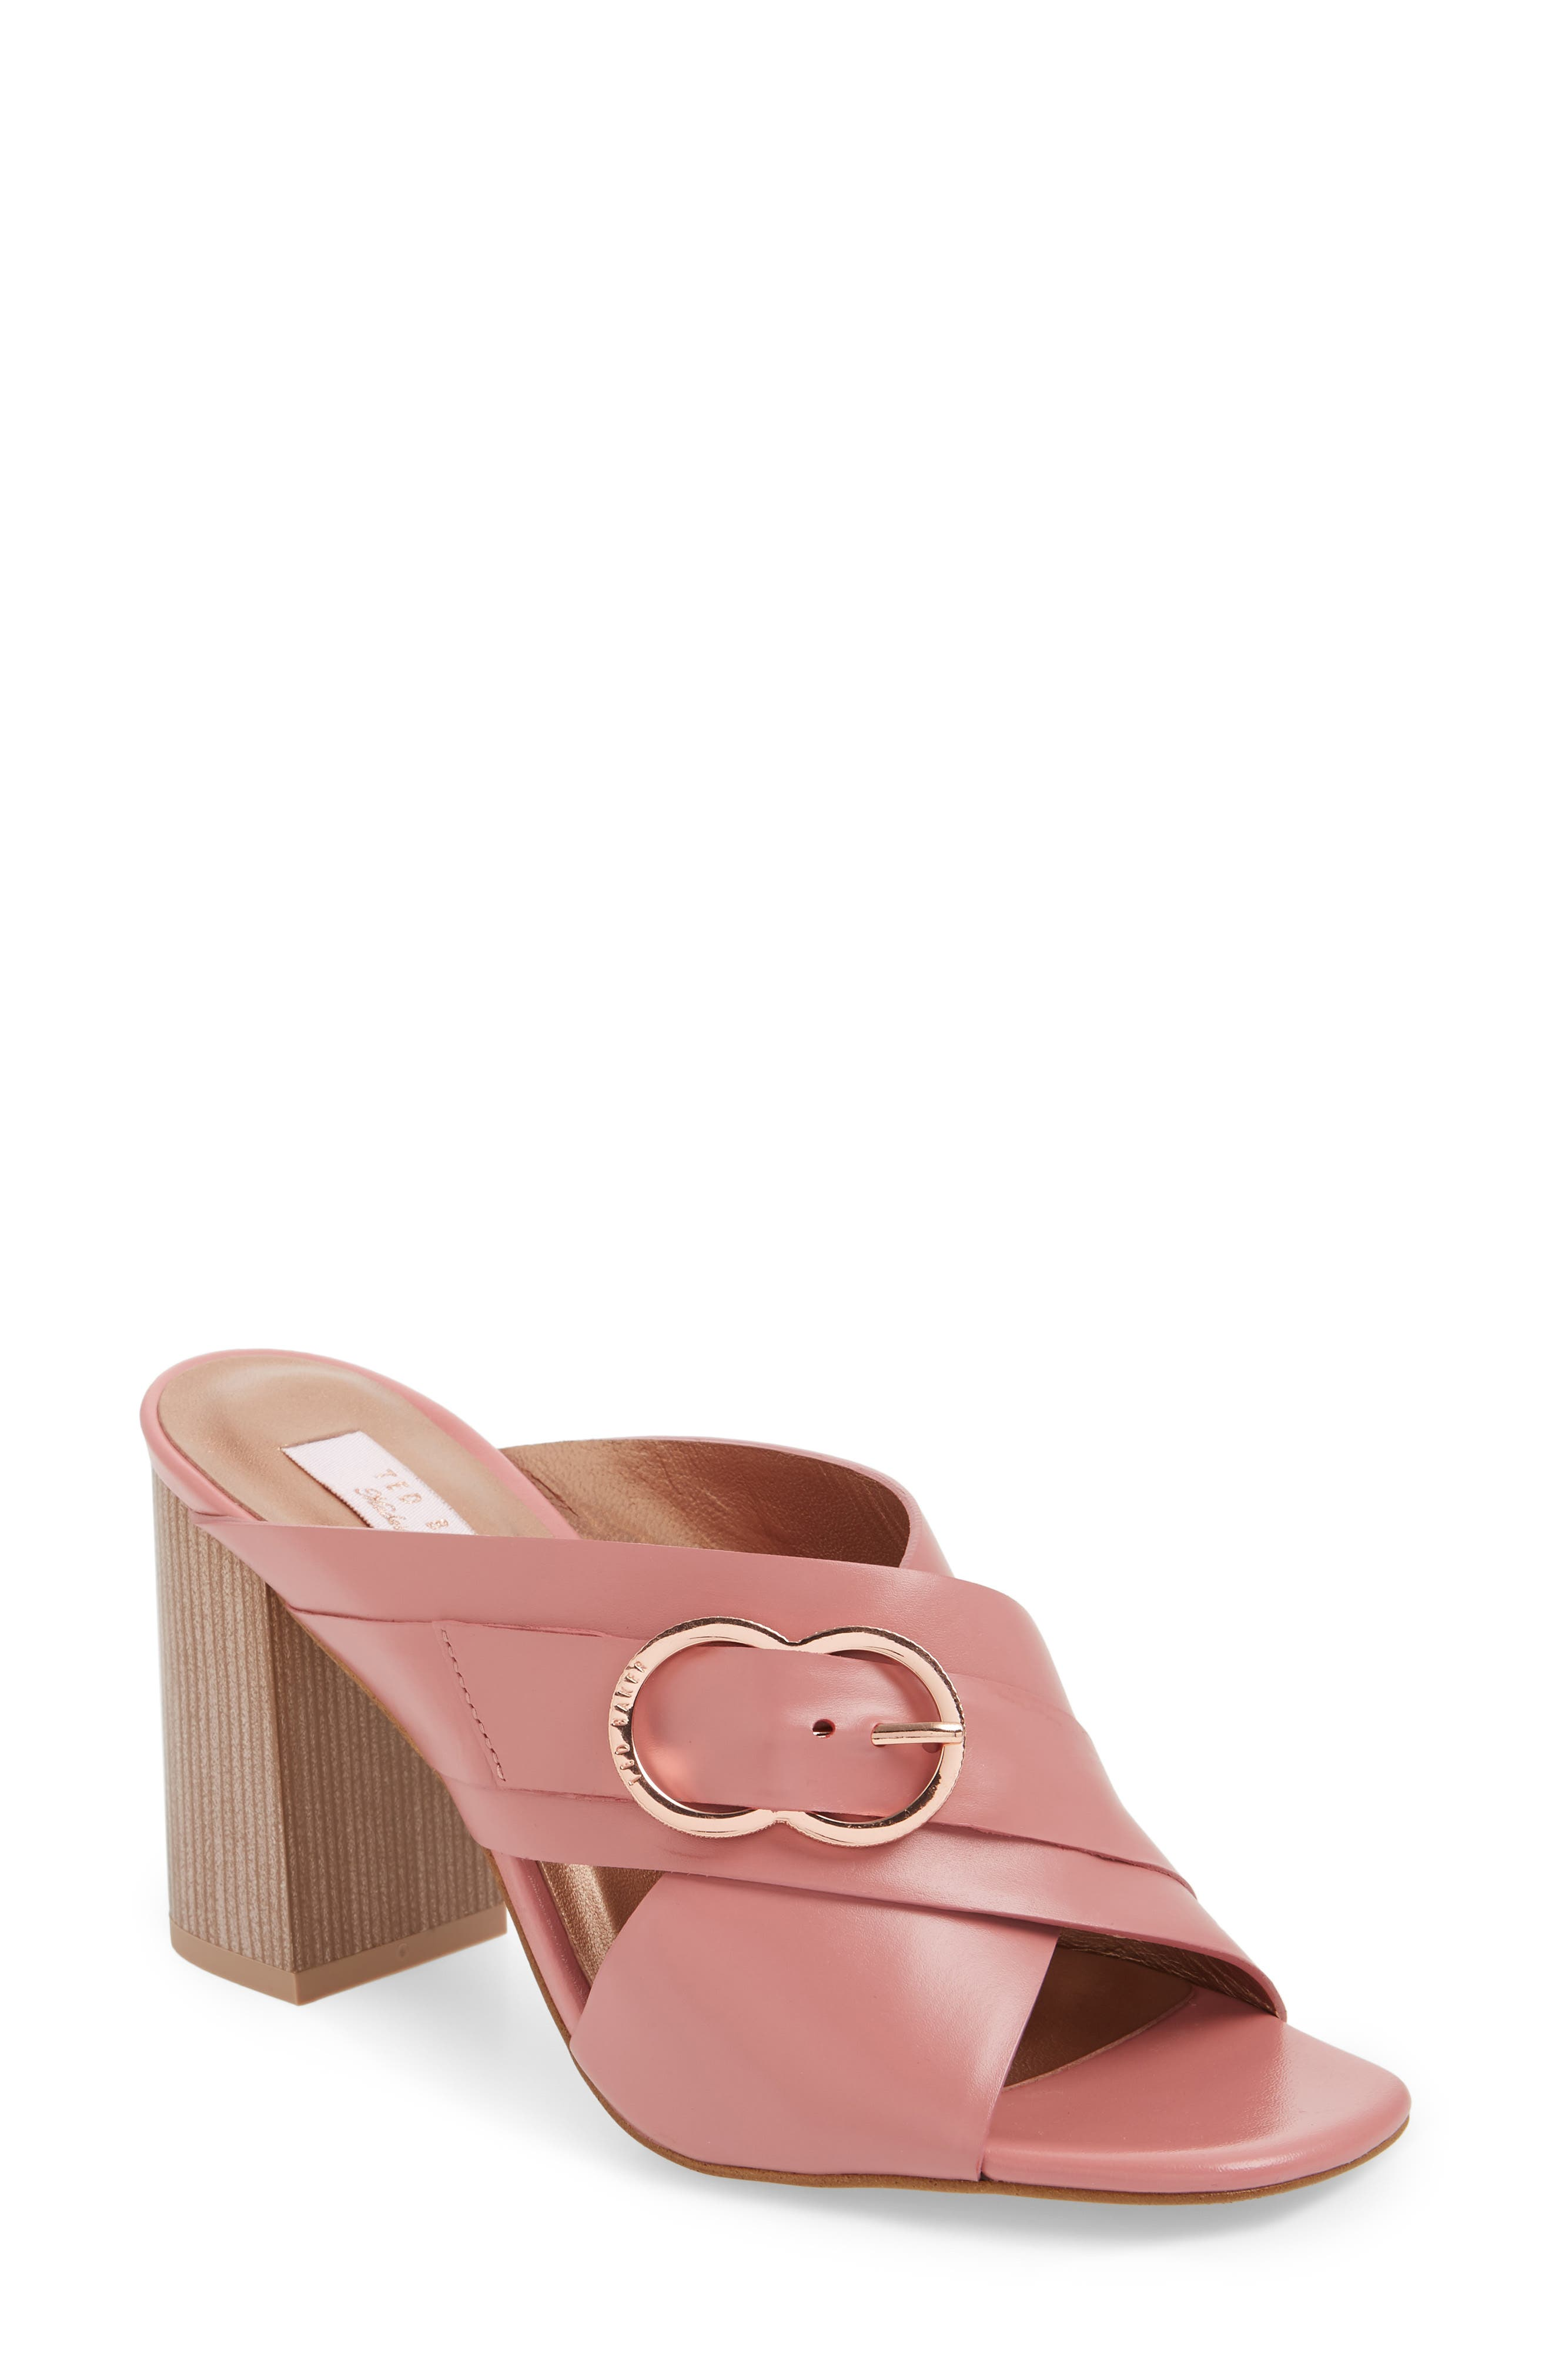 Malada Slide Sandal,                             Main thumbnail 1, color,                             Pink Leather